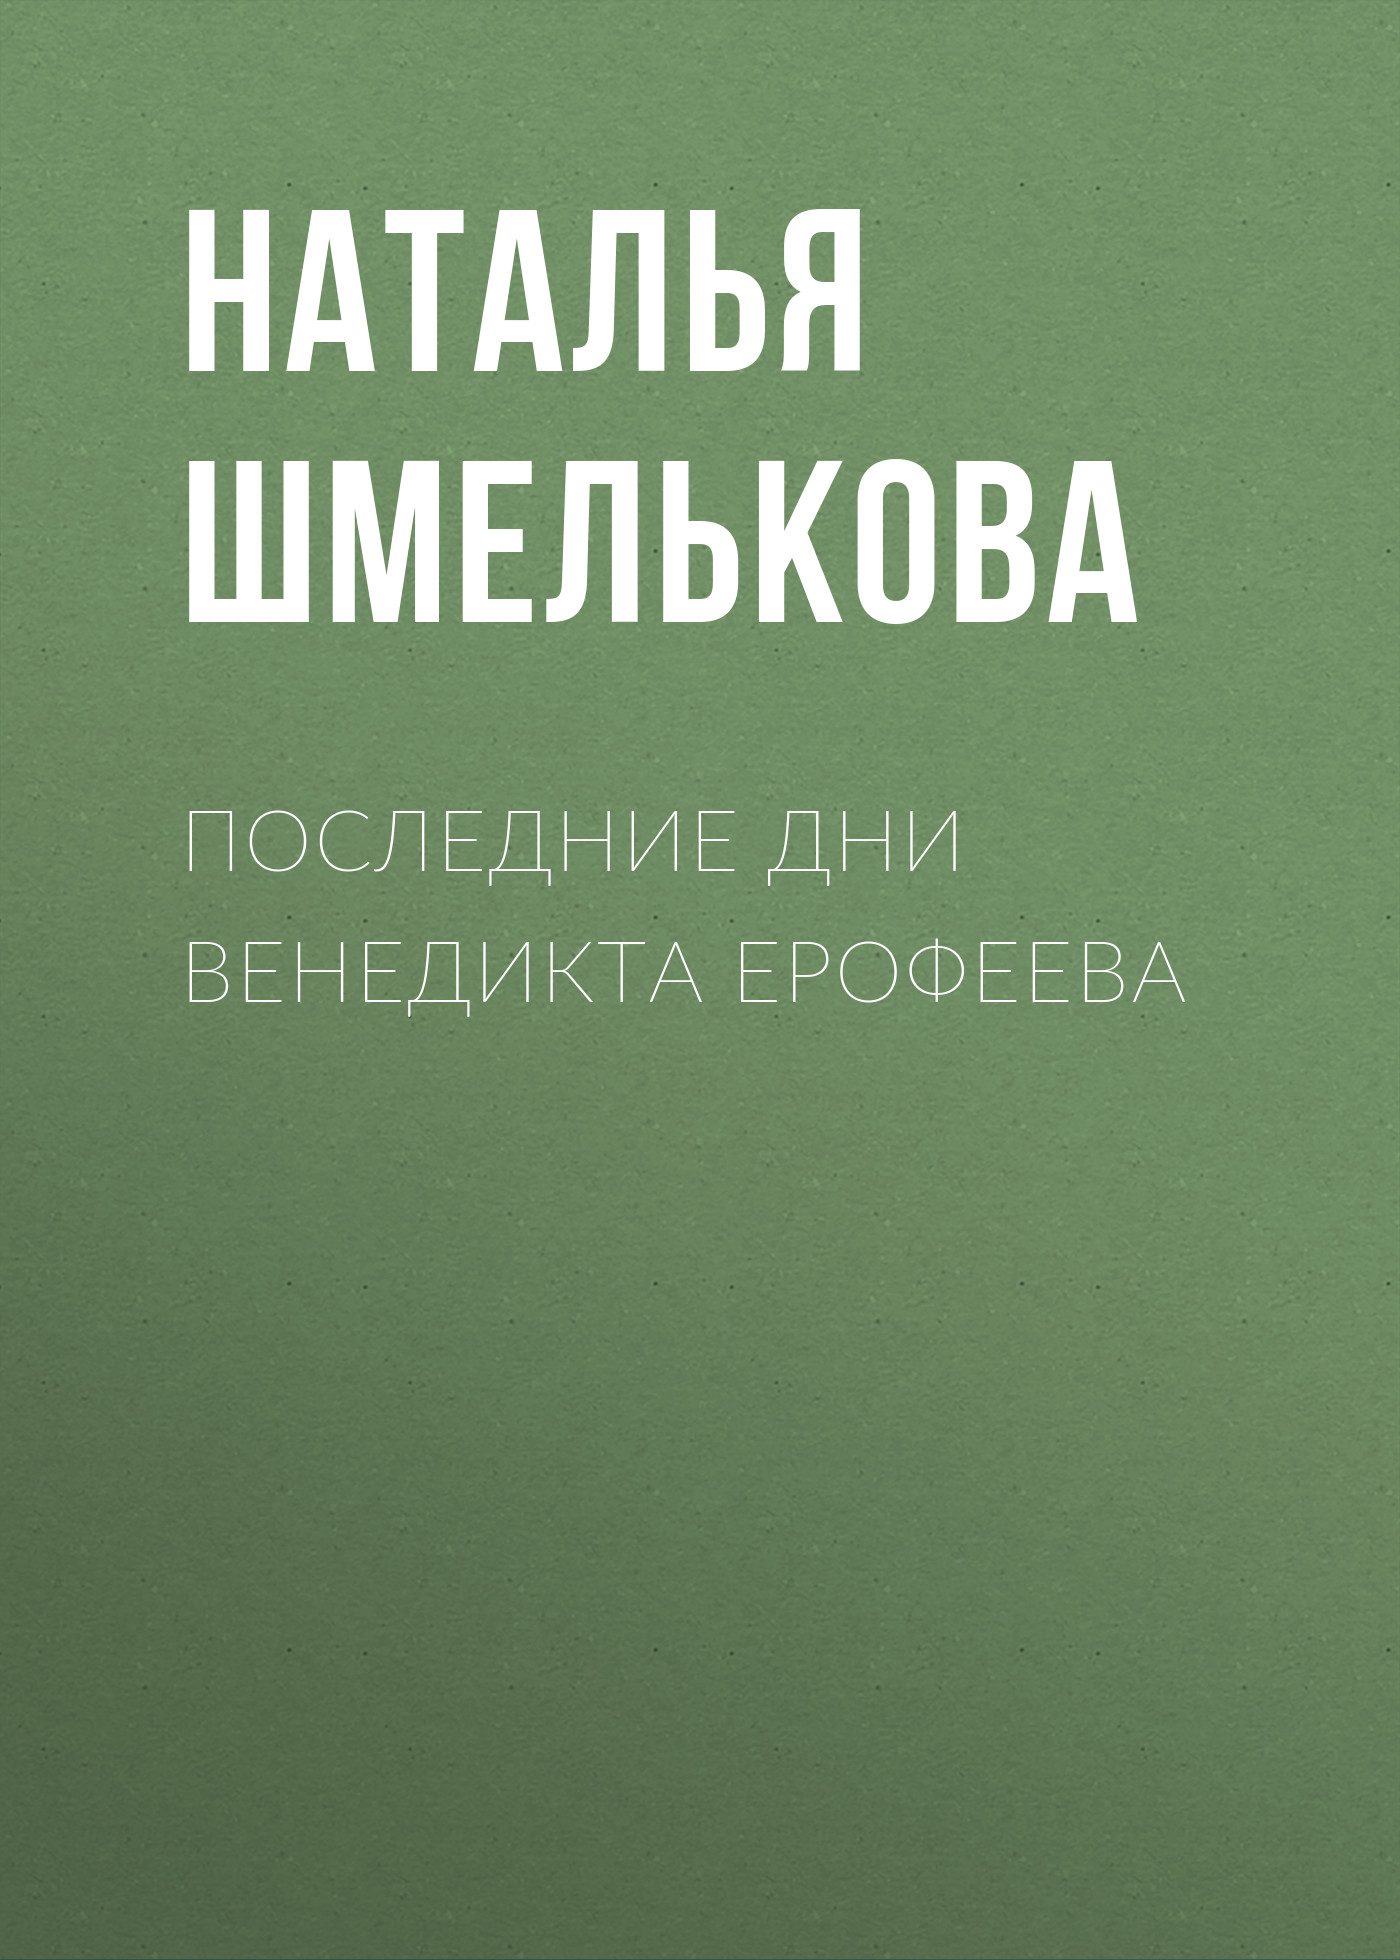 Наталья Шмелькова Последние дни Венедикта Ерофеева цена и фото